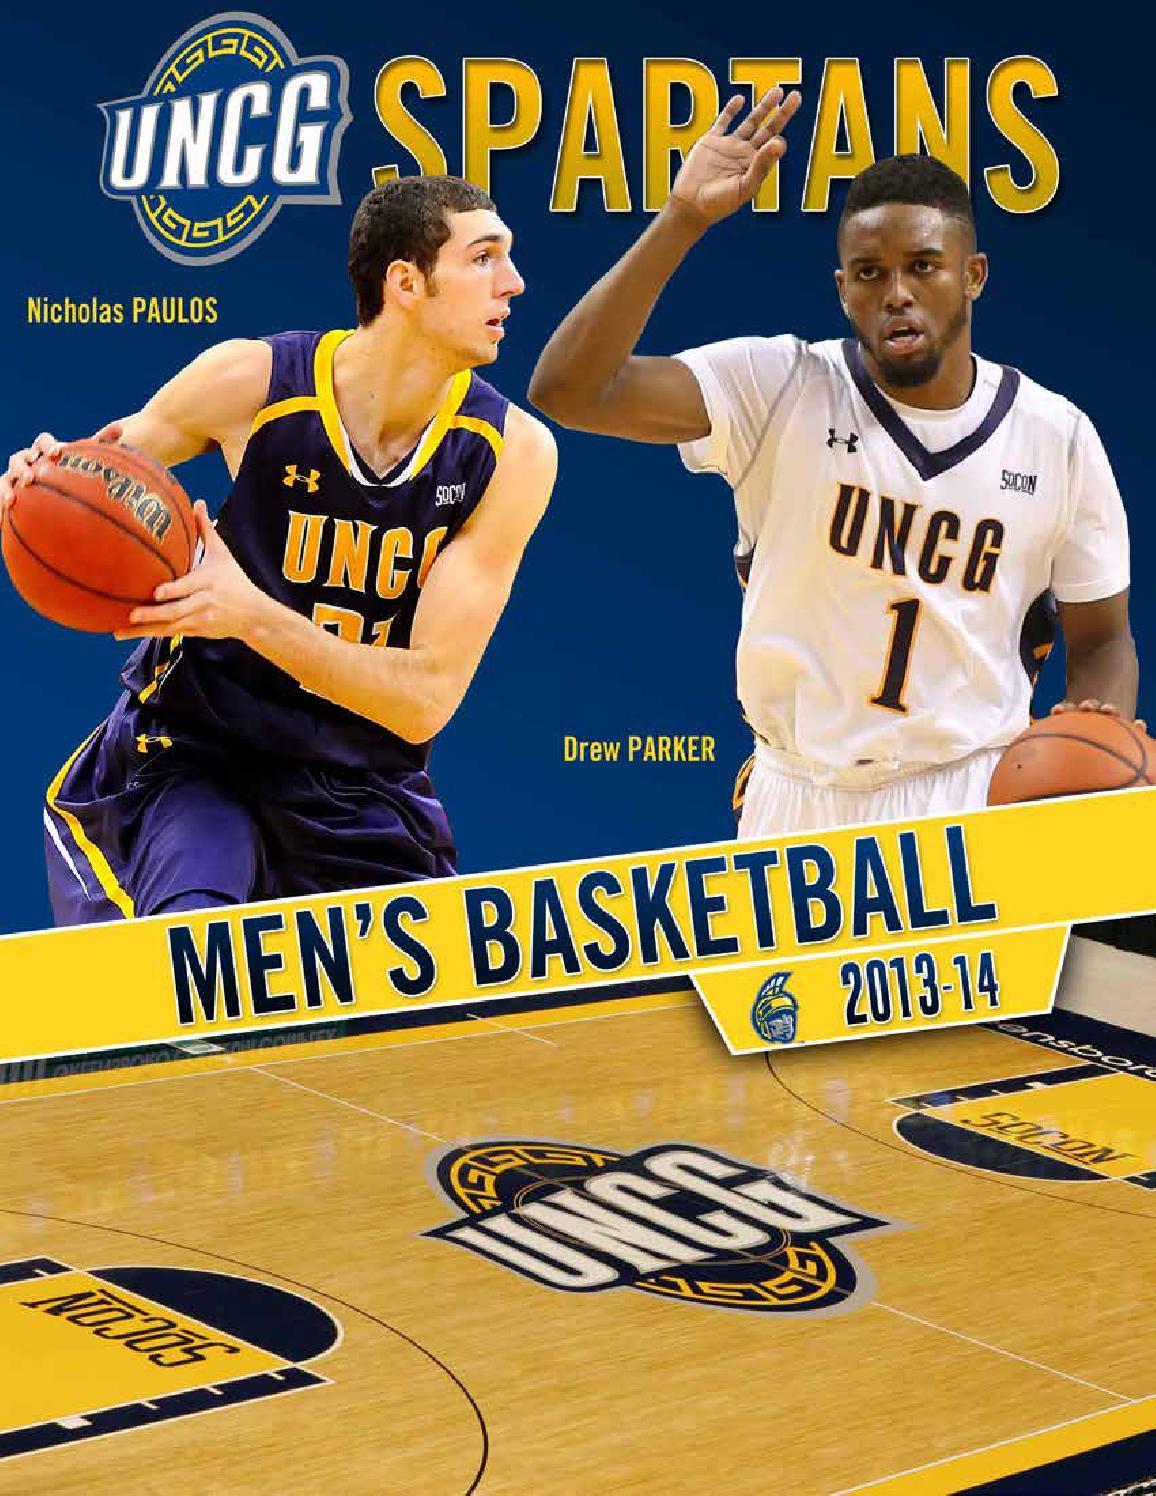 2013-14 UNCG Men s Basketball Digital Guide by UNCG Athletics - issuu db24b8d5b